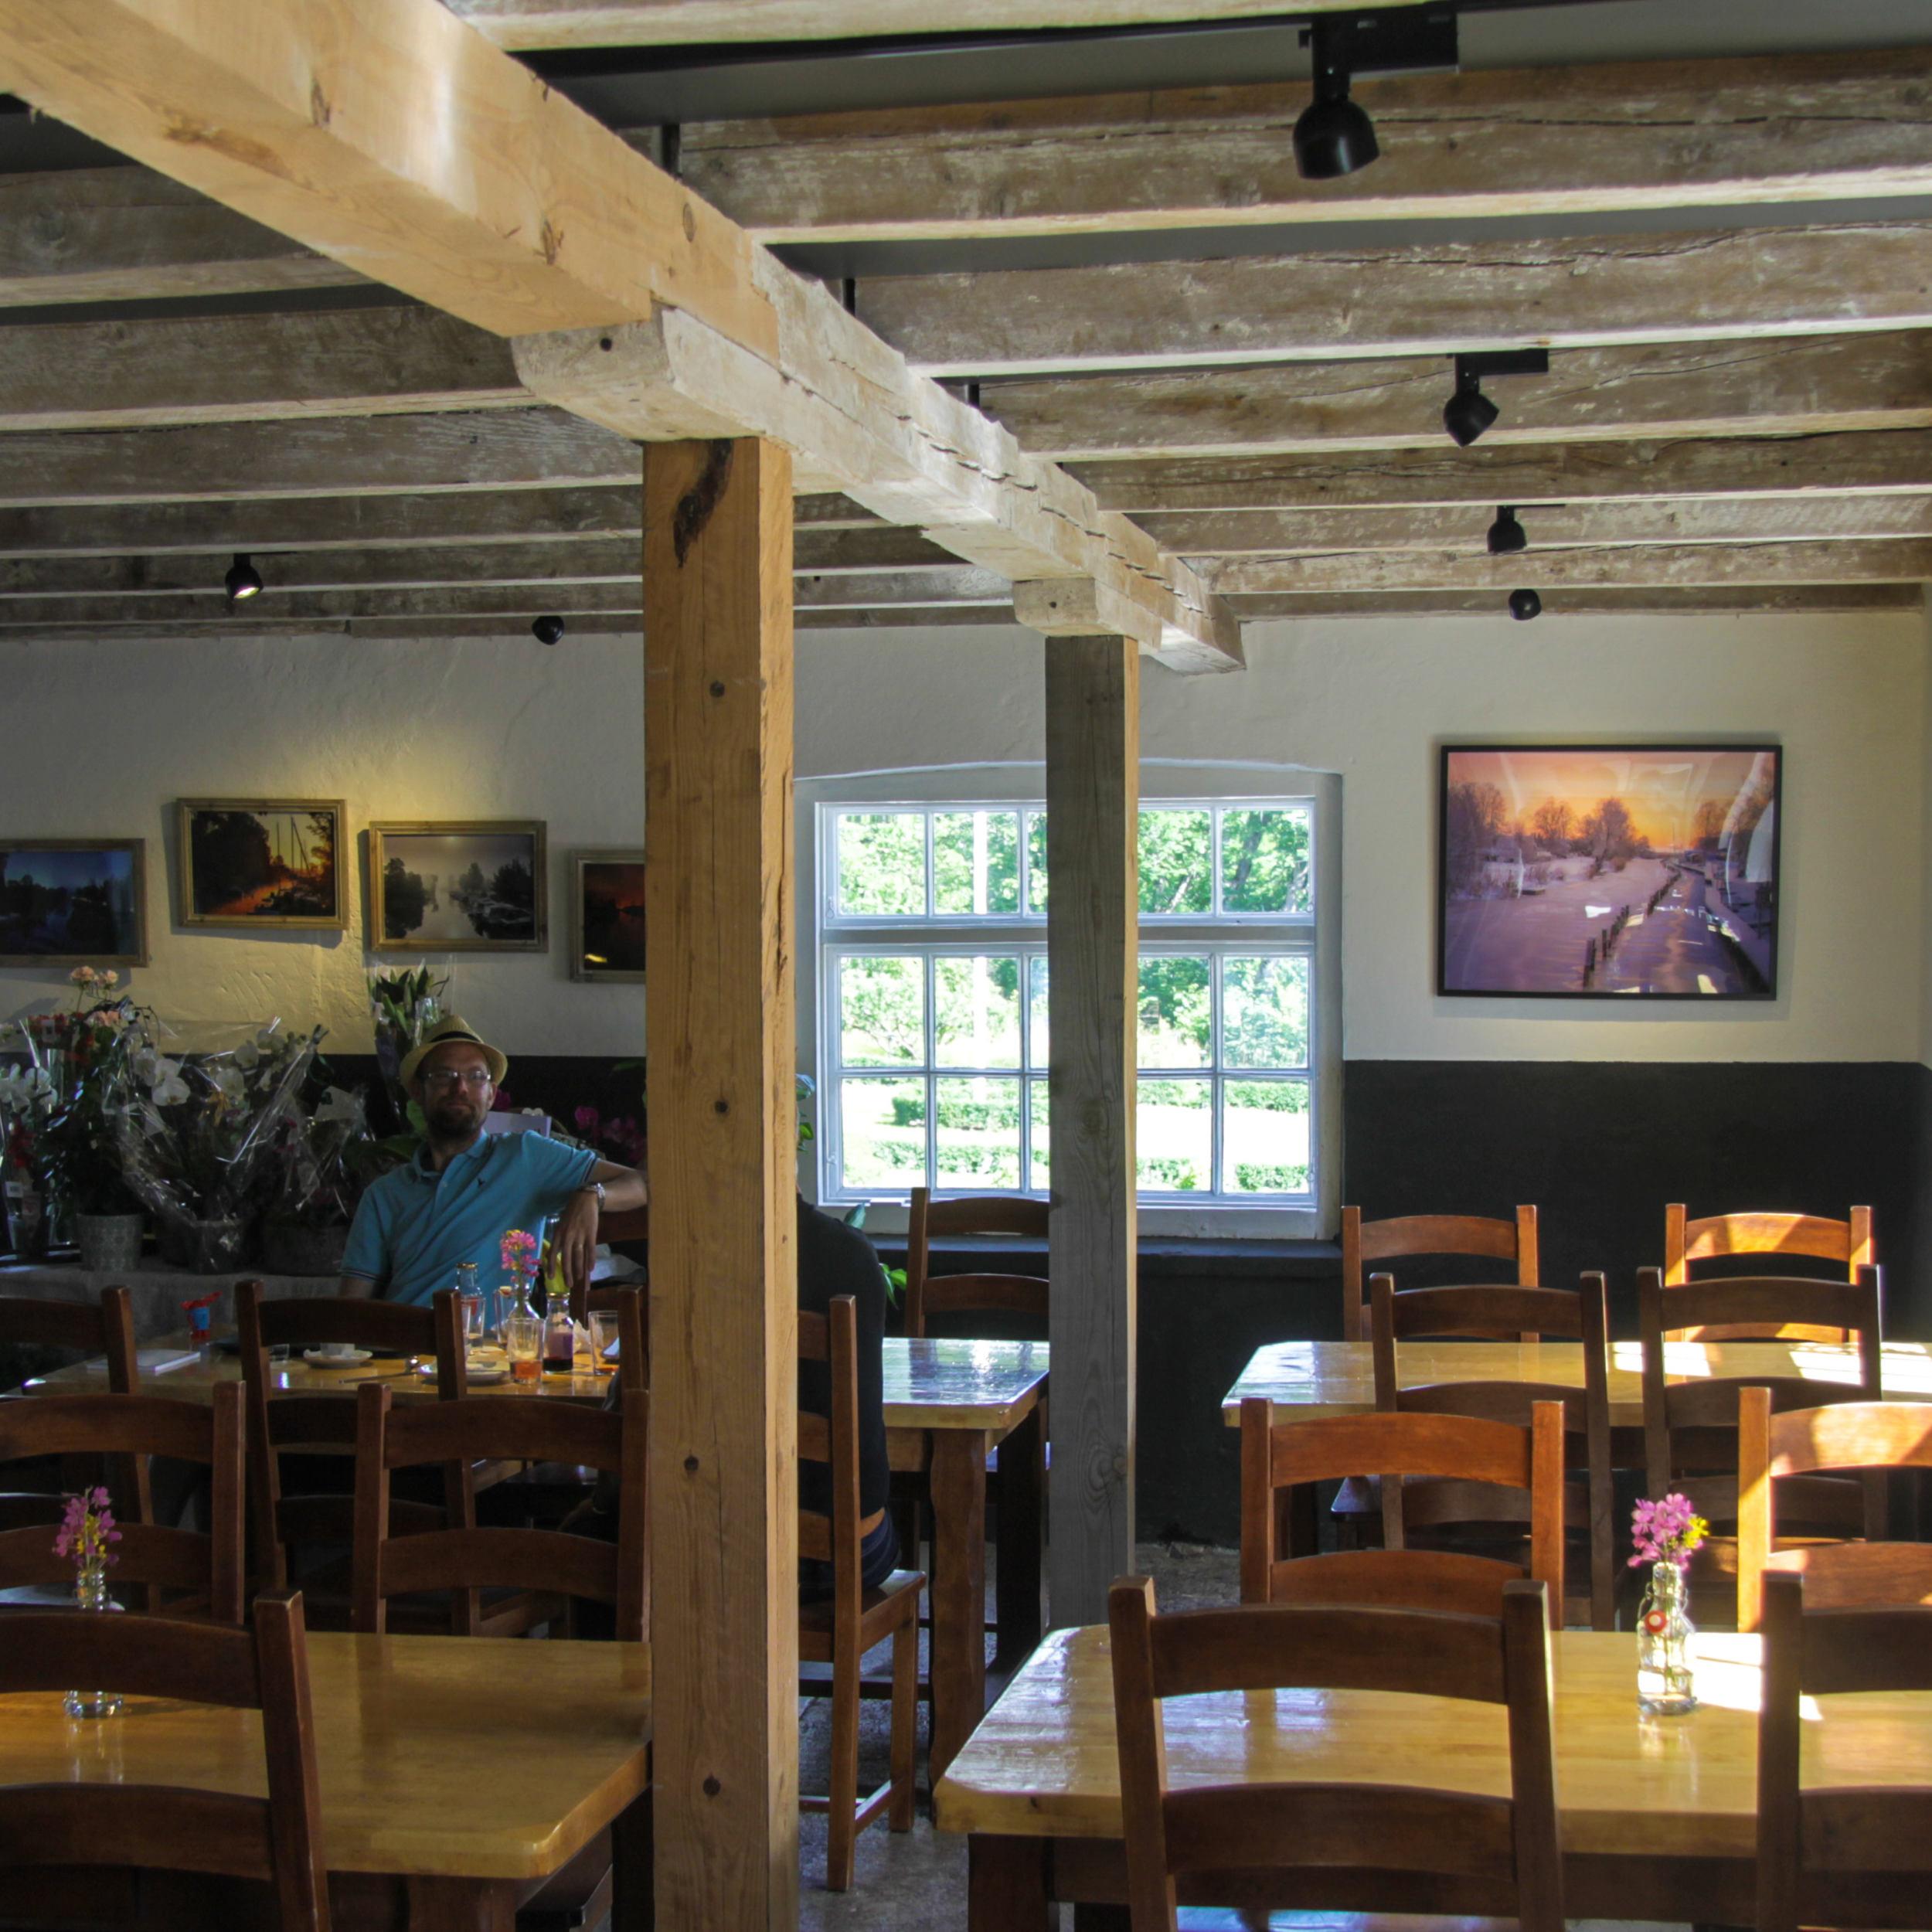 Salnecke castle cafe interior